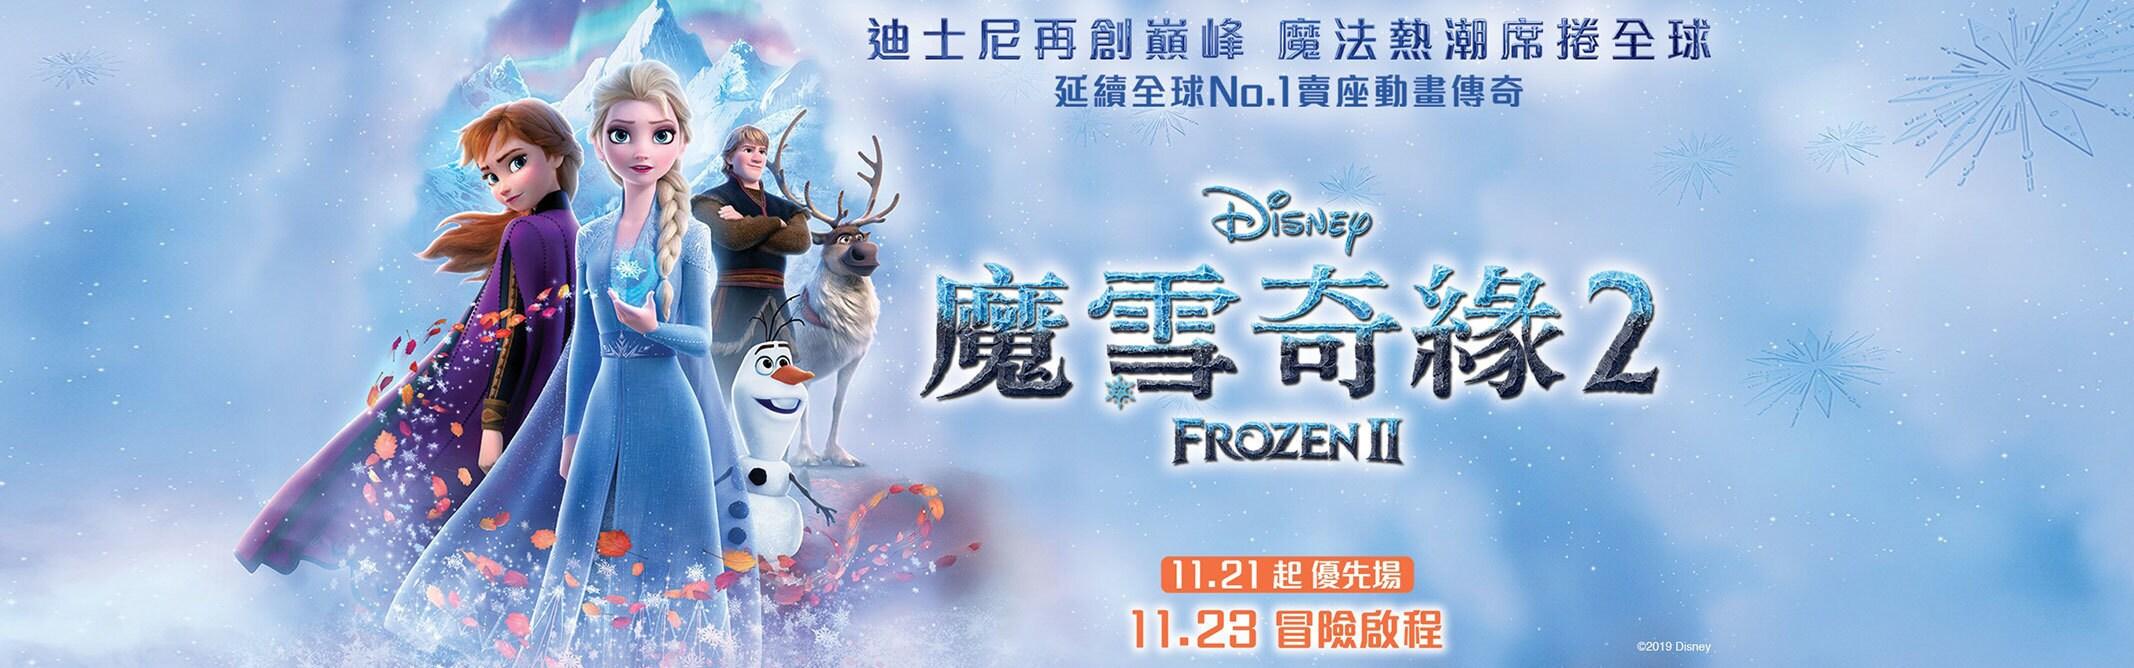 Frozen 2 - Disney HK